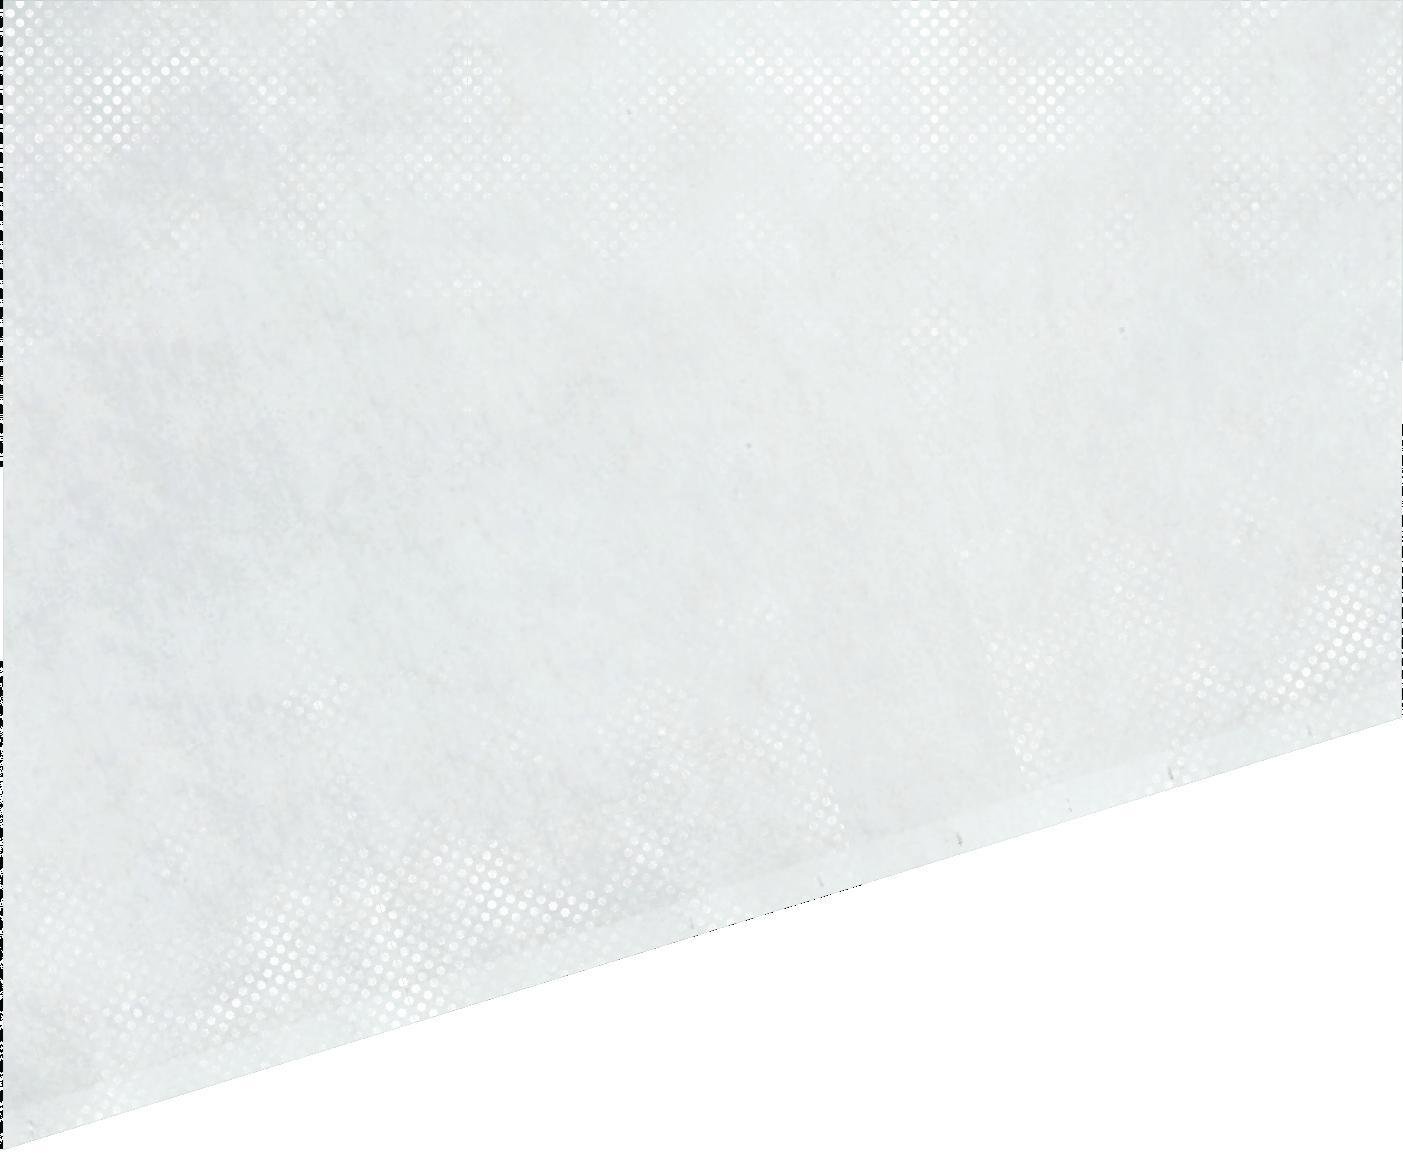 Datz Restaurant Newsprint-Background-Angled-02